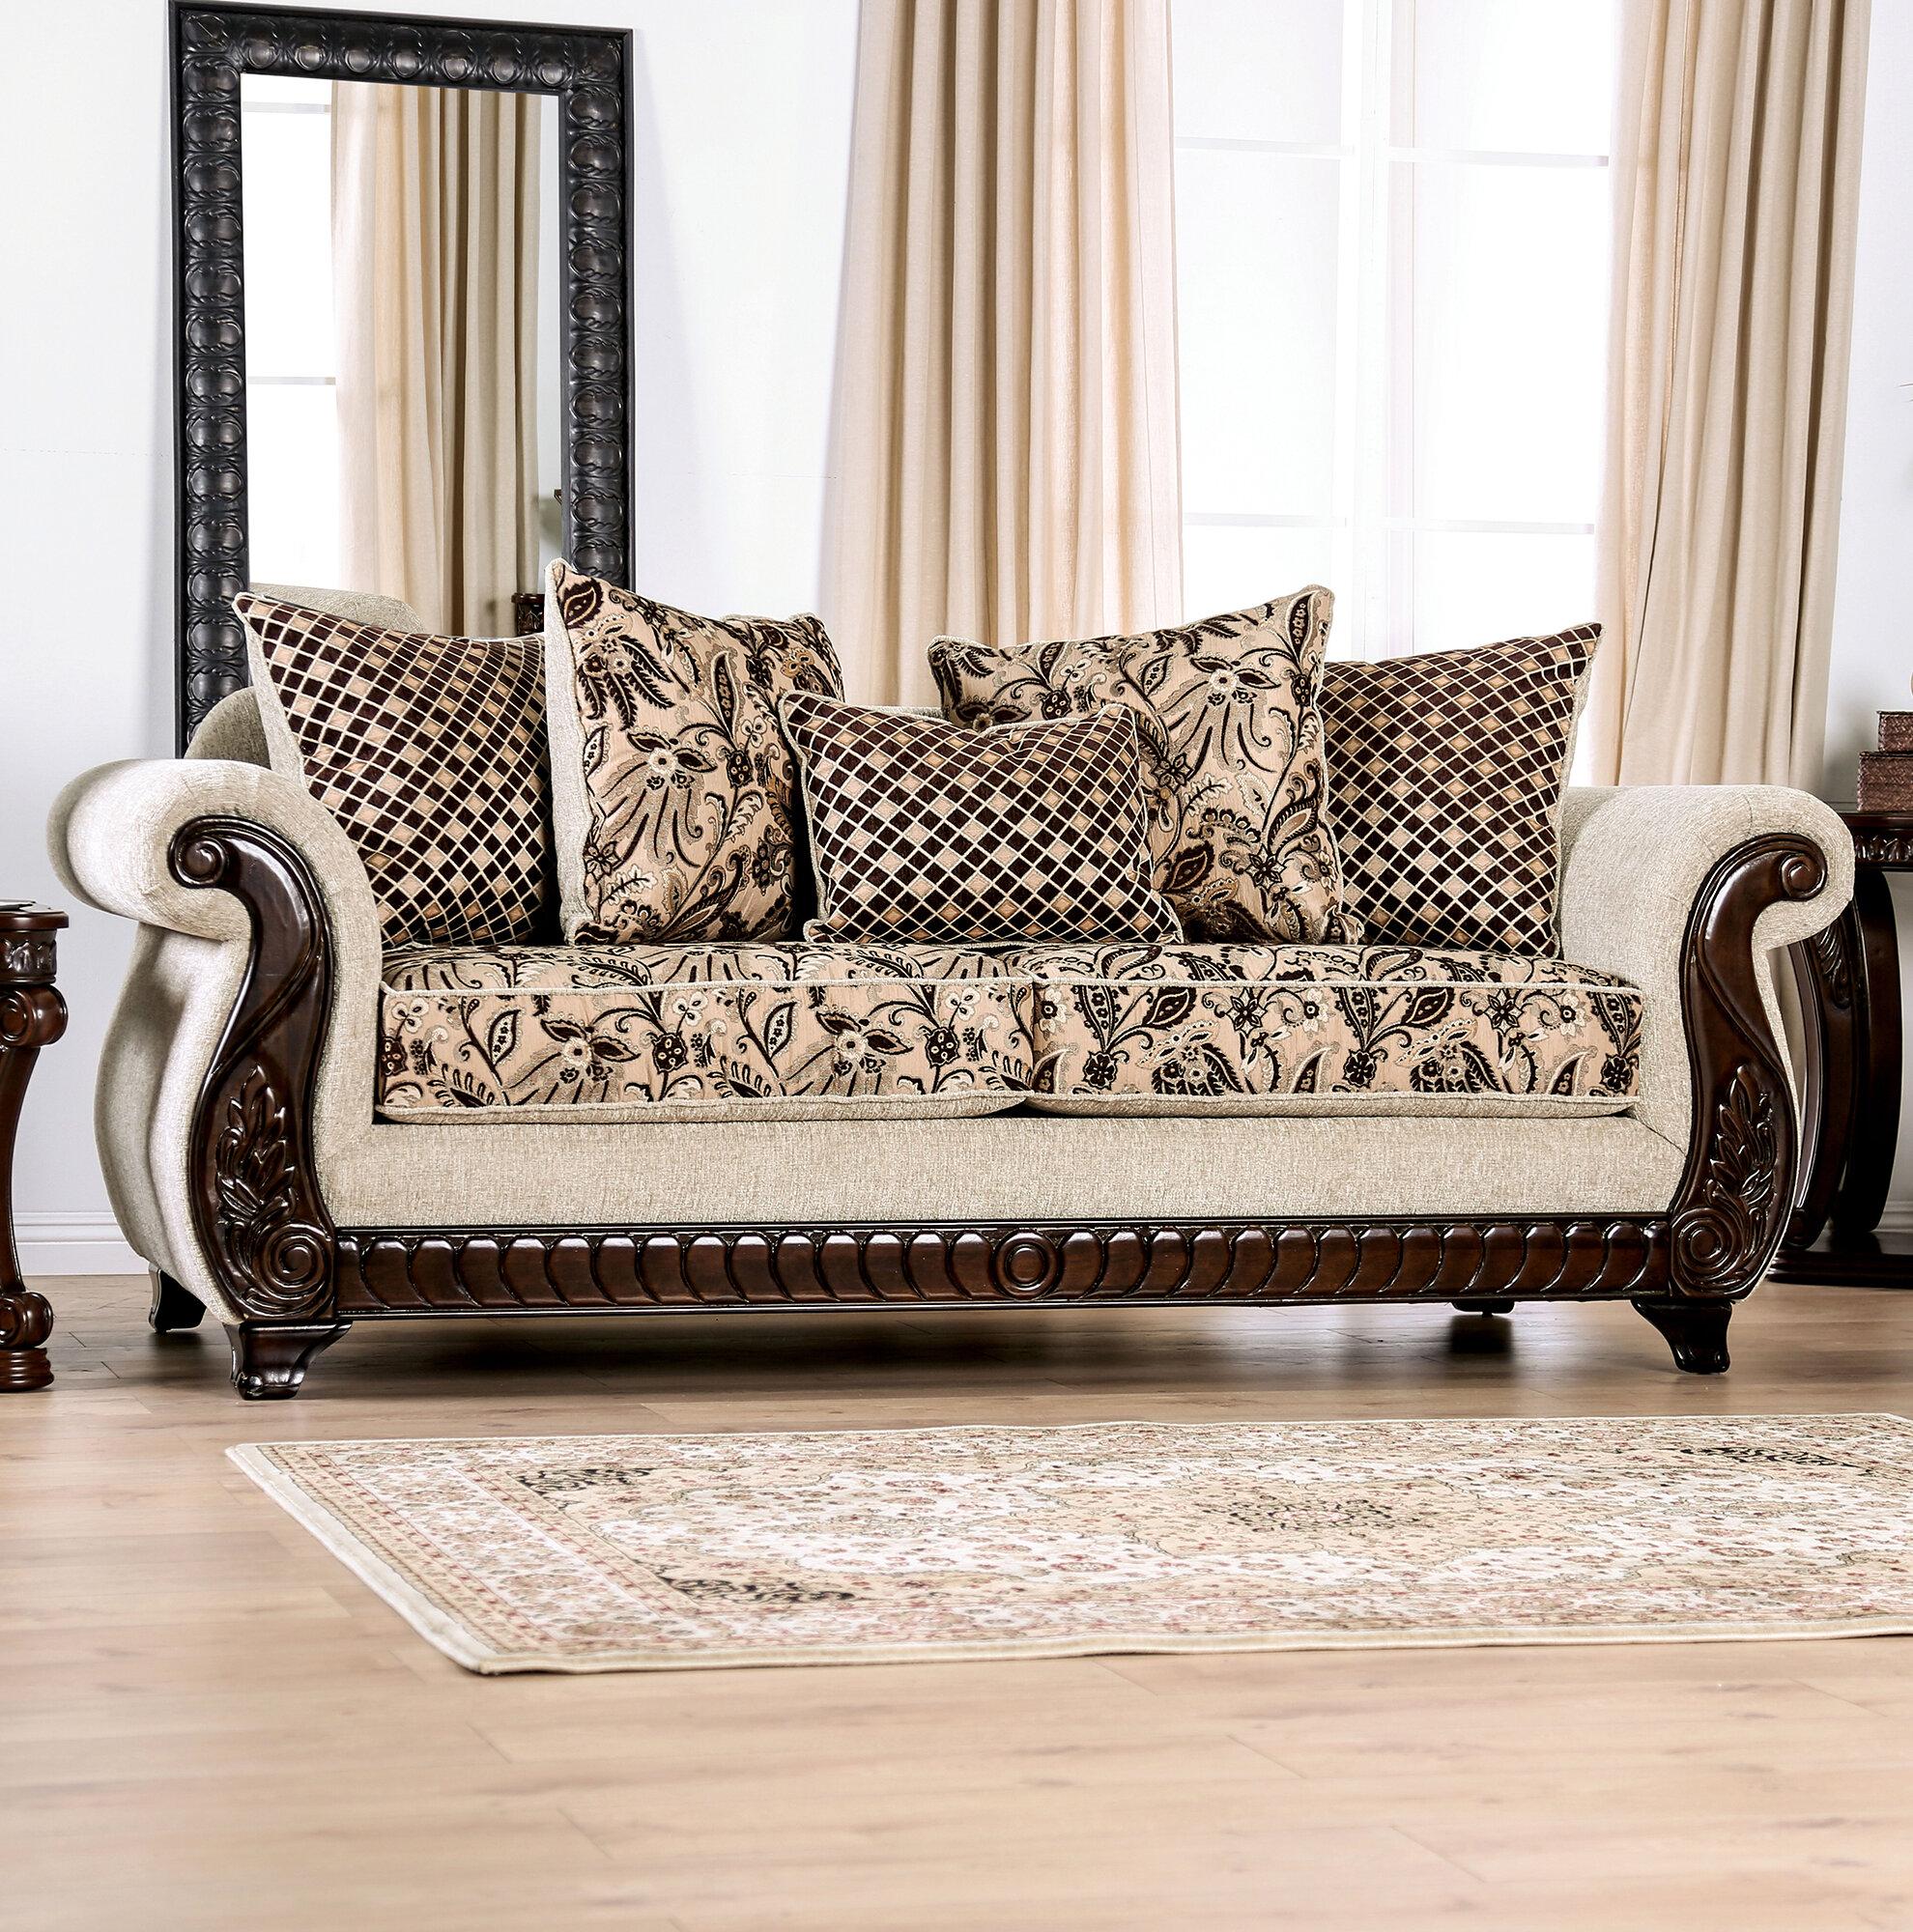 Surprising Renetta Rolled Arms Sofa Spiritservingveterans Wood Chair Design Ideas Spiritservingveteransorg